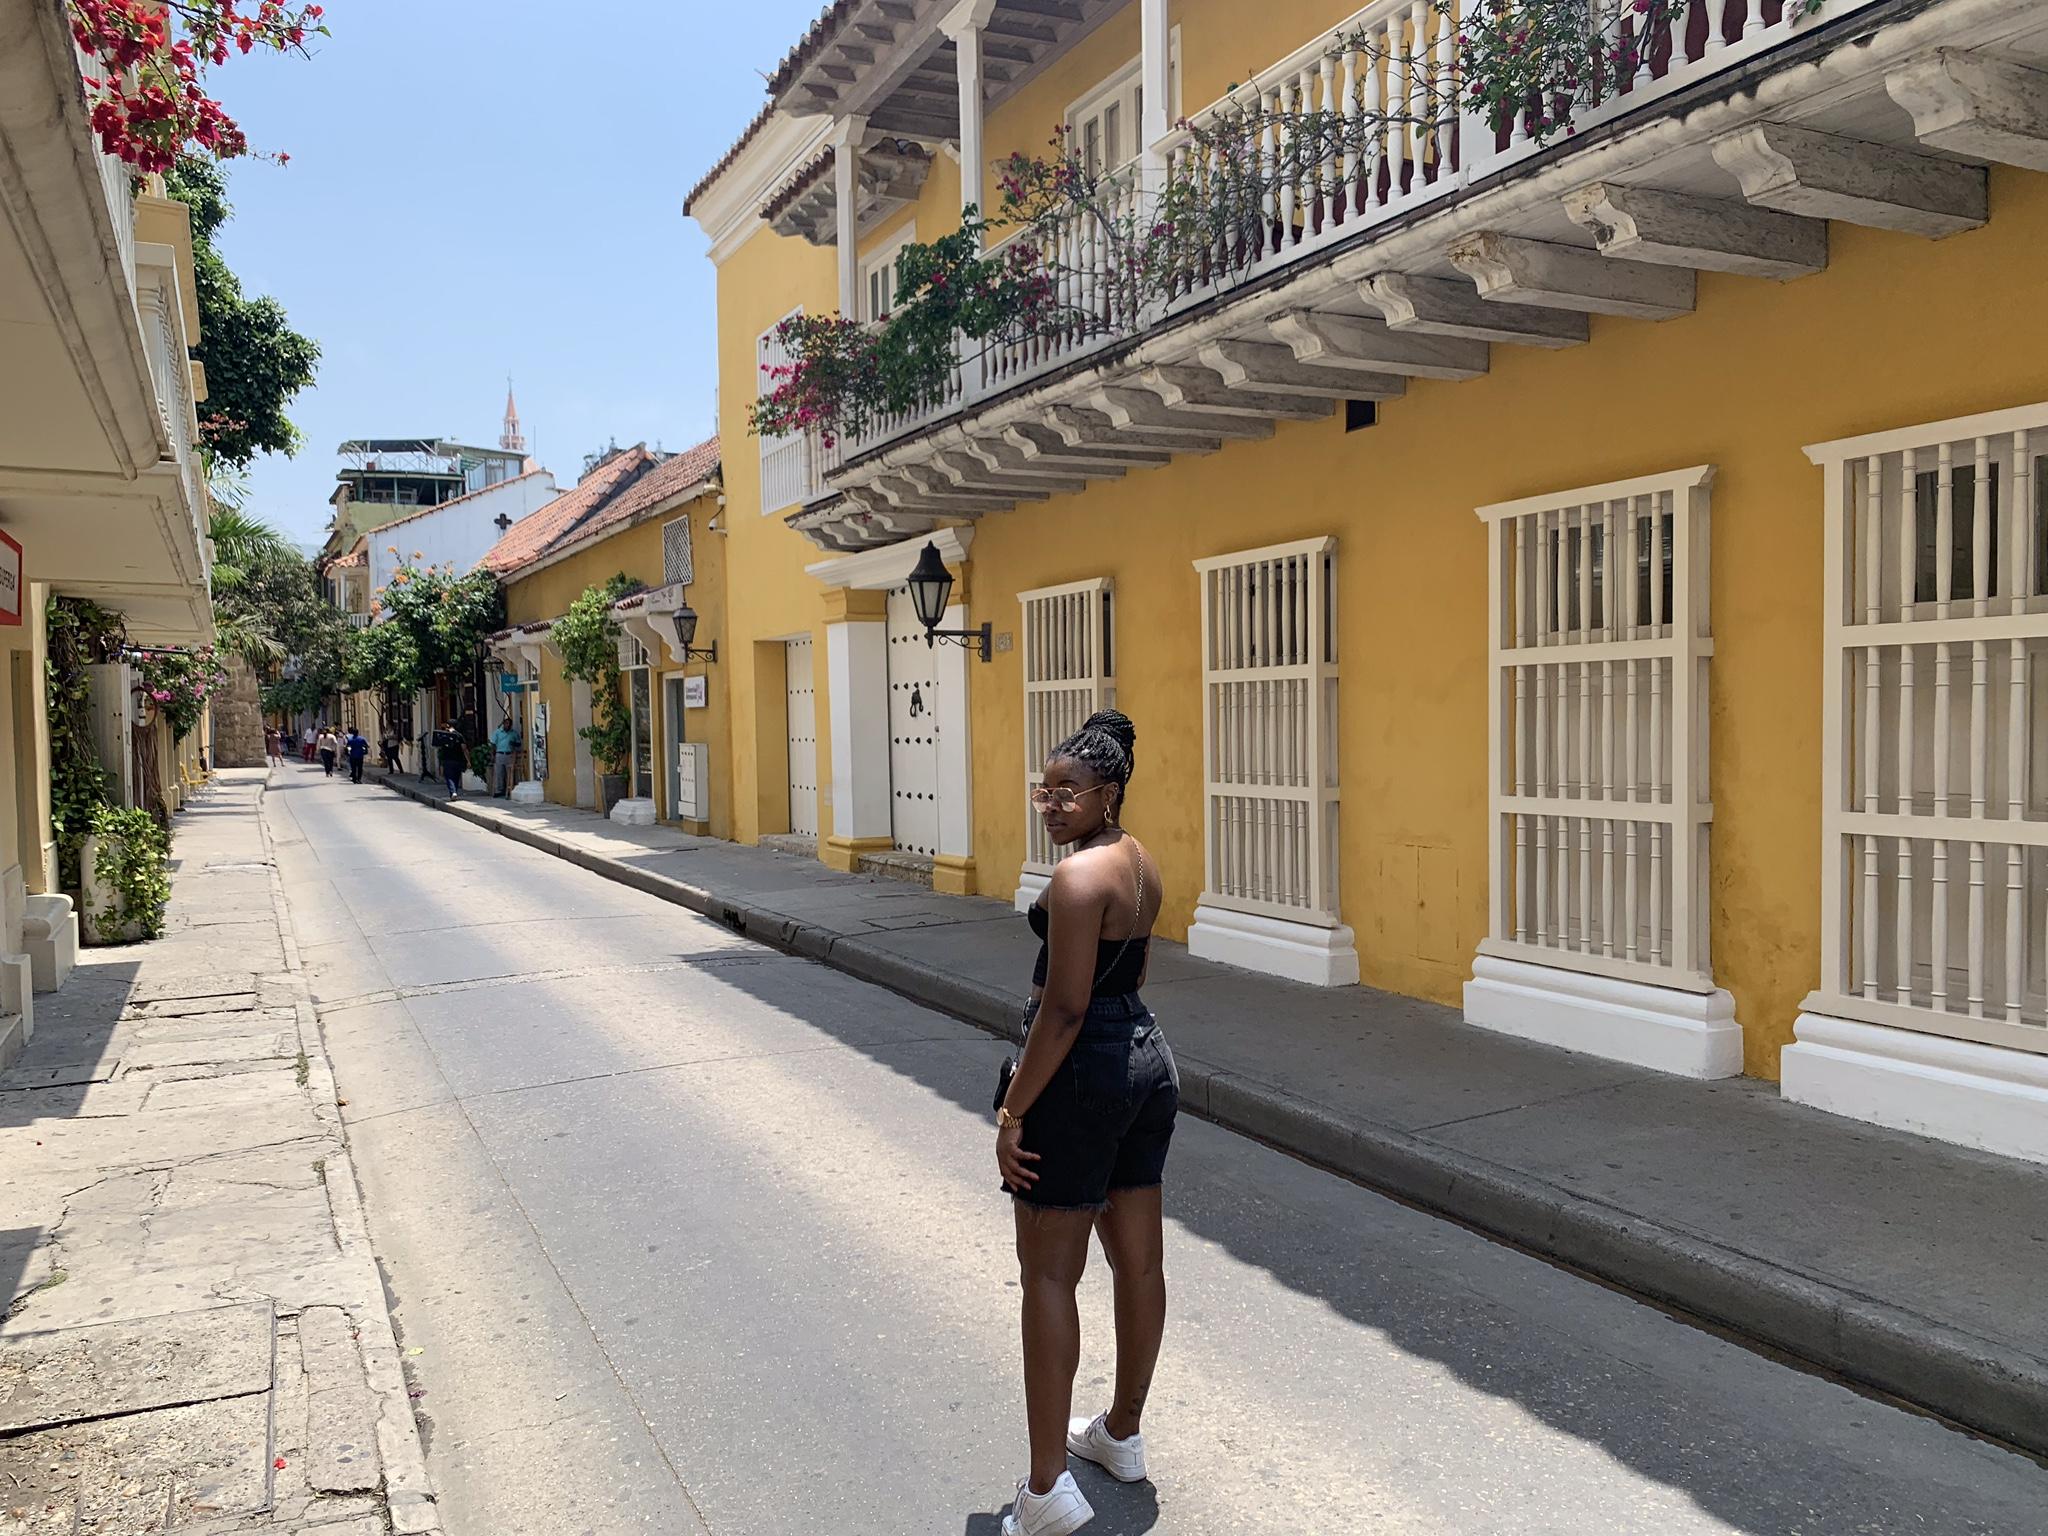 Marthadahhling Visit Cartagena, Colombia.JPEG